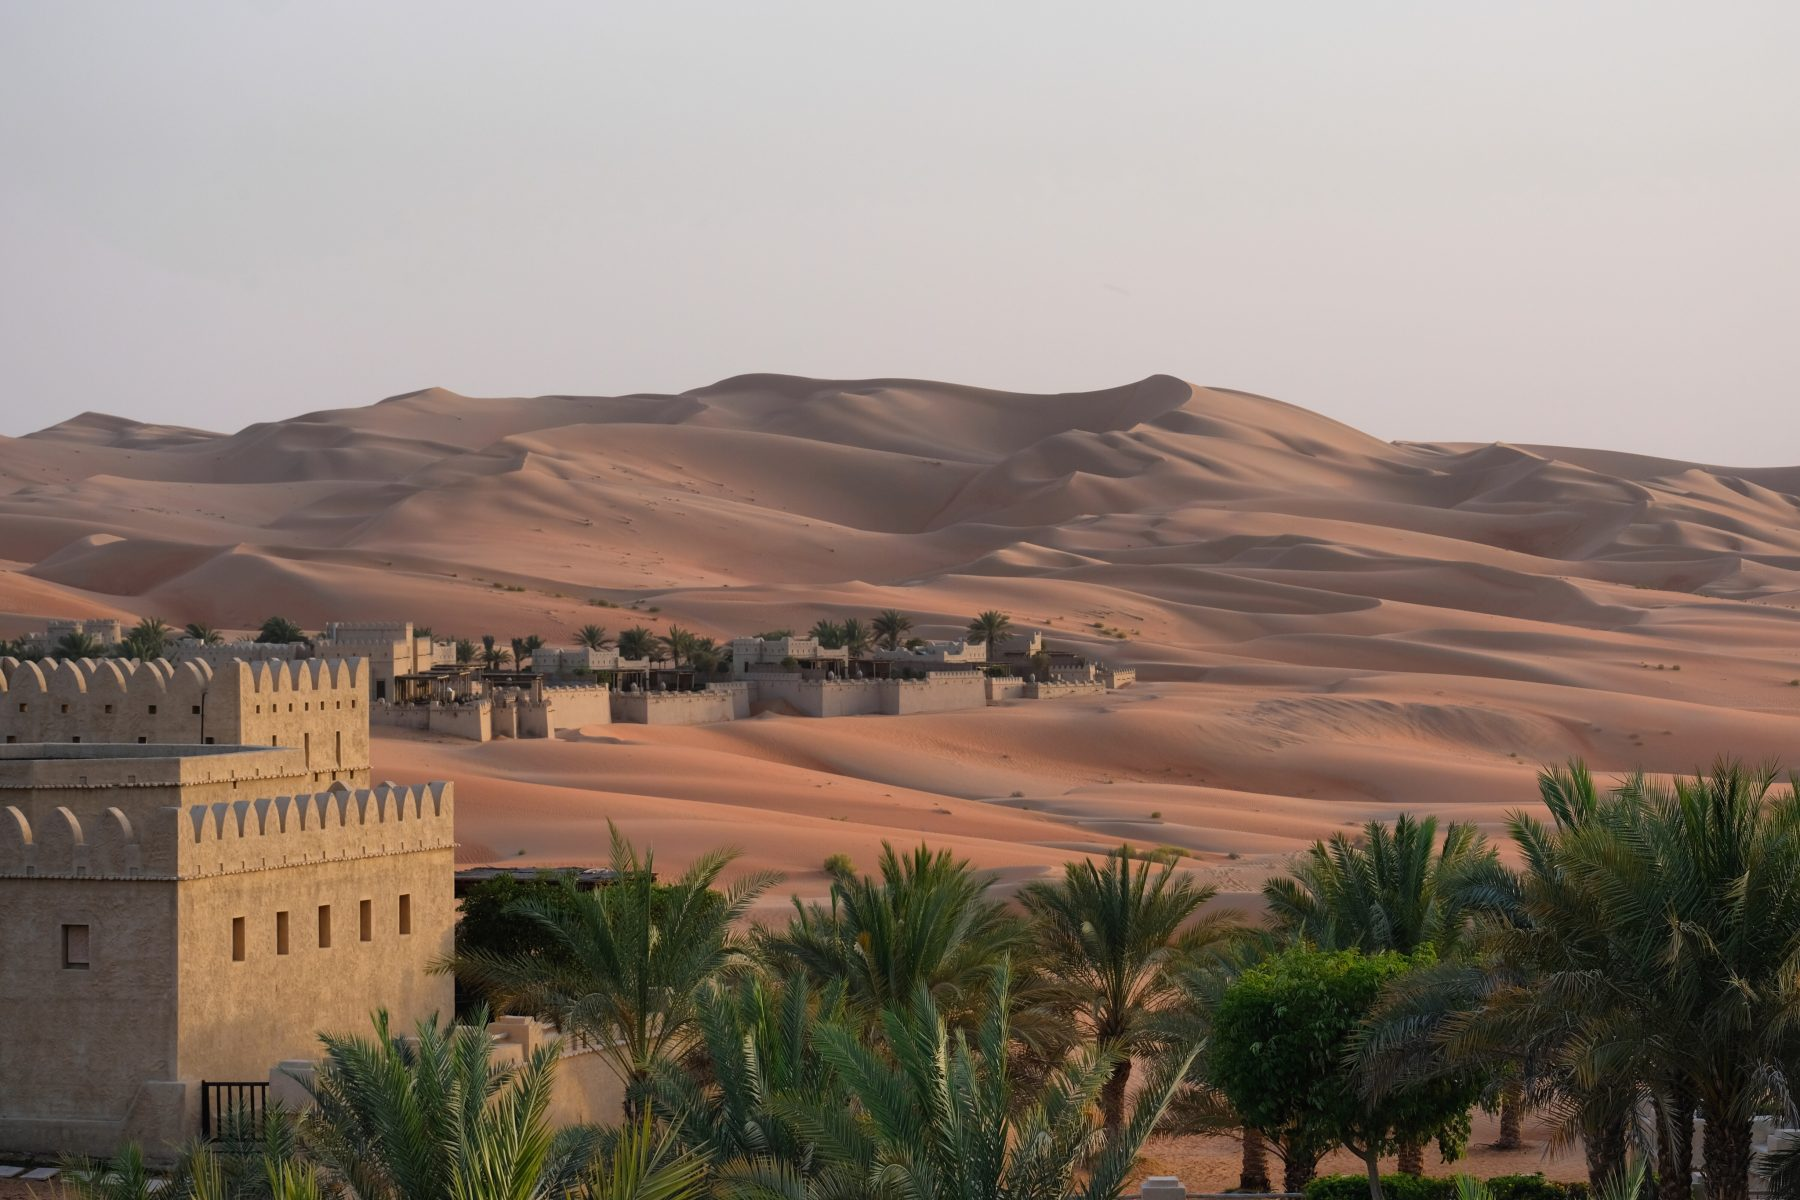 The Most Luxurious Desert Hotel in the World: Qasr Al Sarab